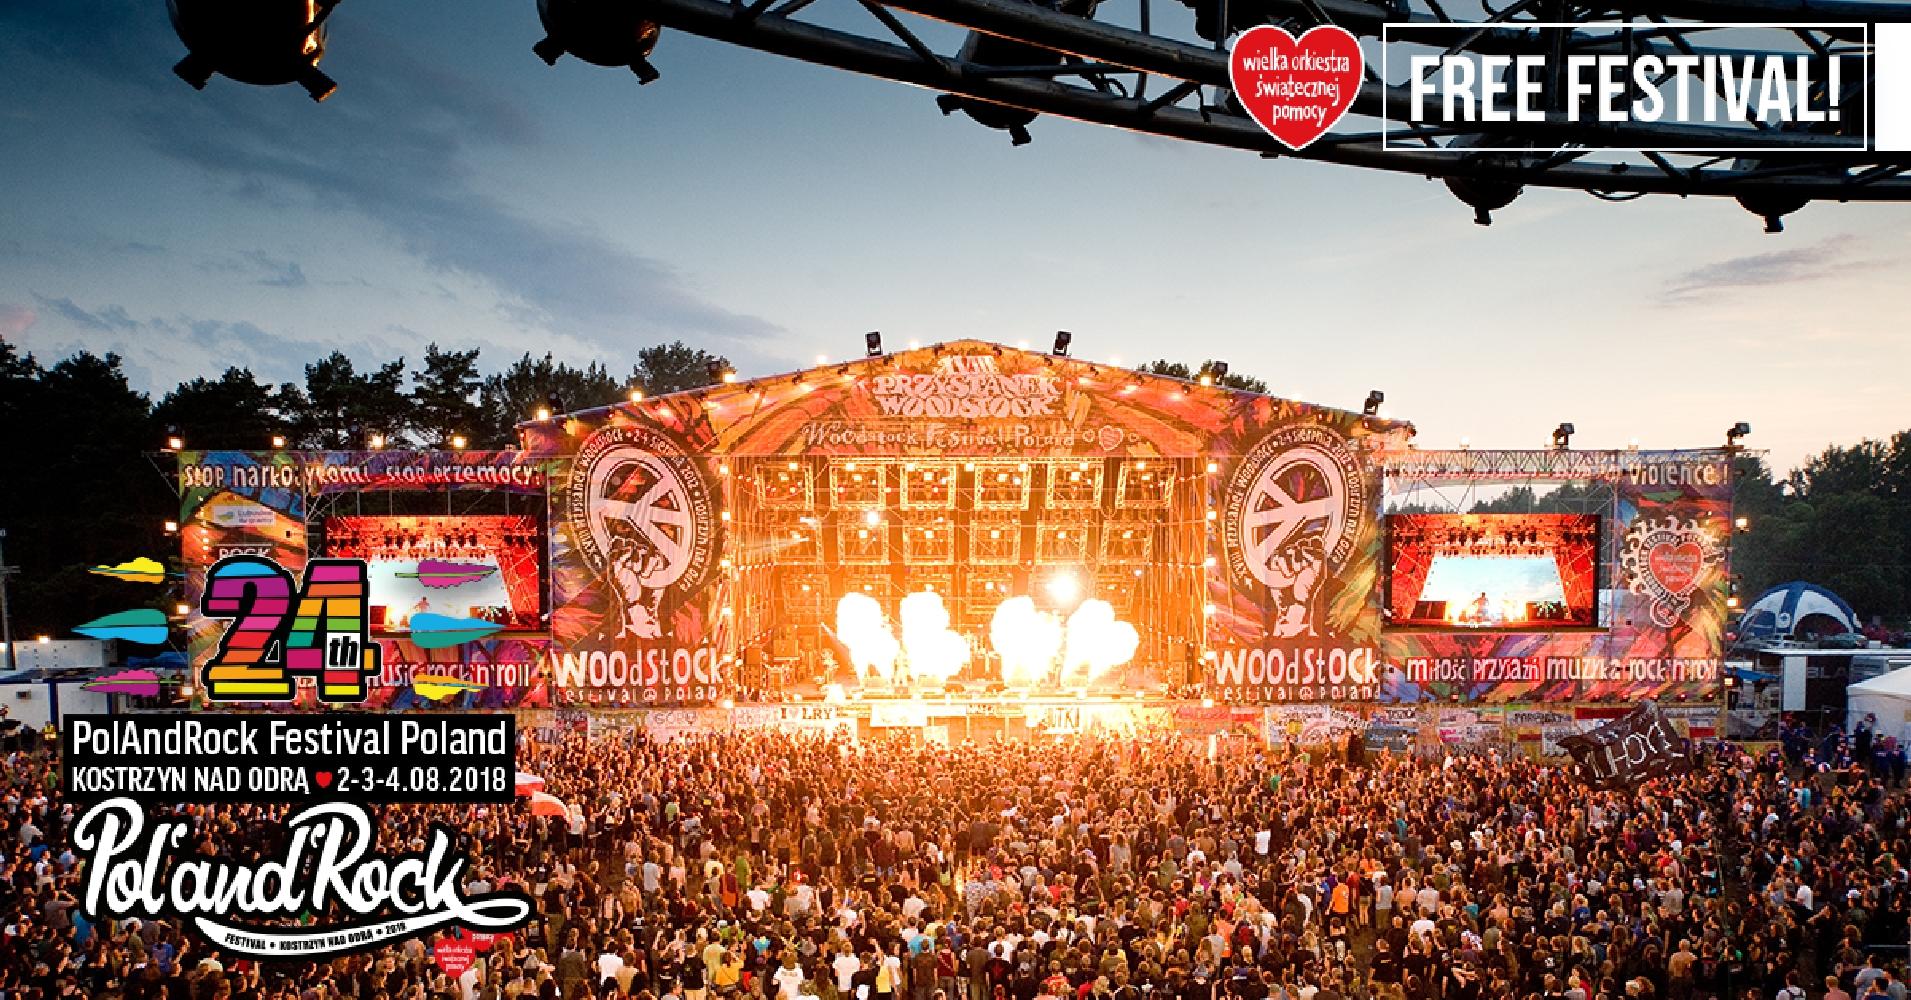 Gratis PolAndRock Festival 2018, das neue Woodstock Festival in Kostrzyn PL